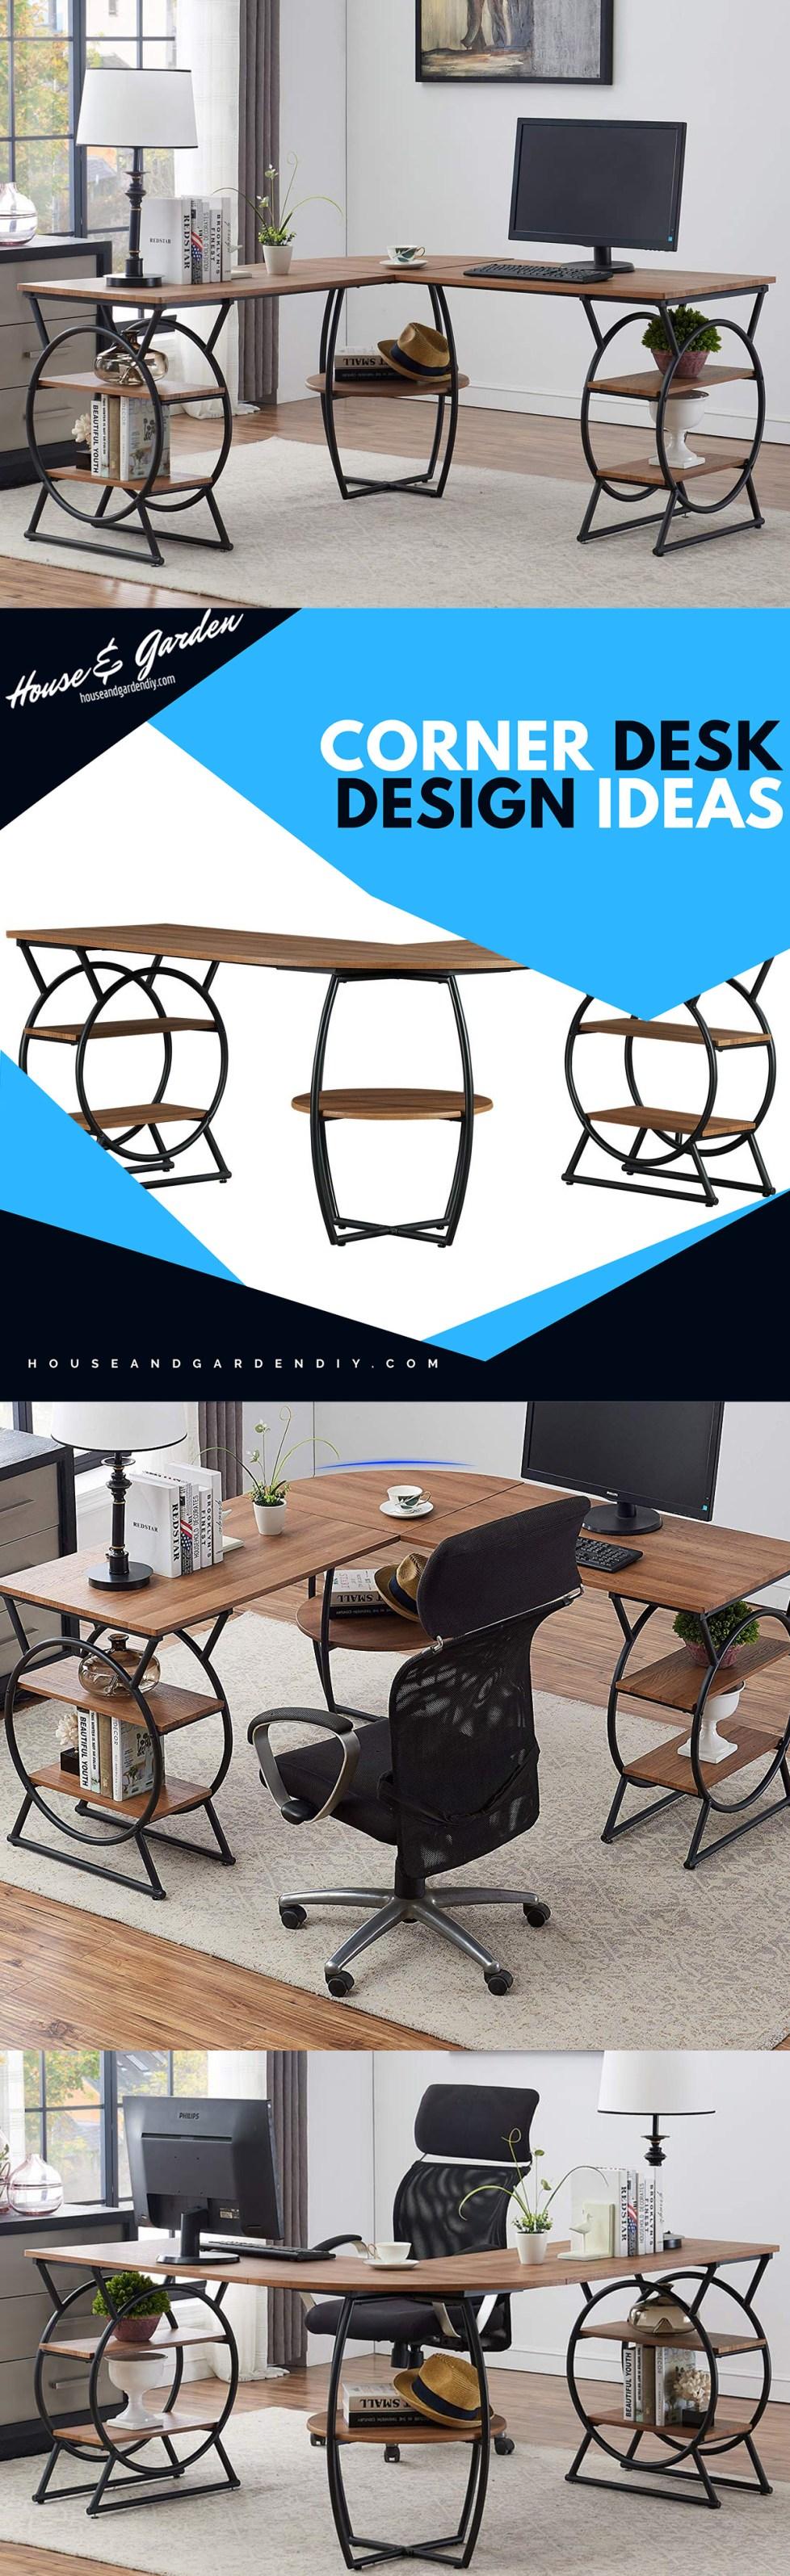 corner office desk ideas